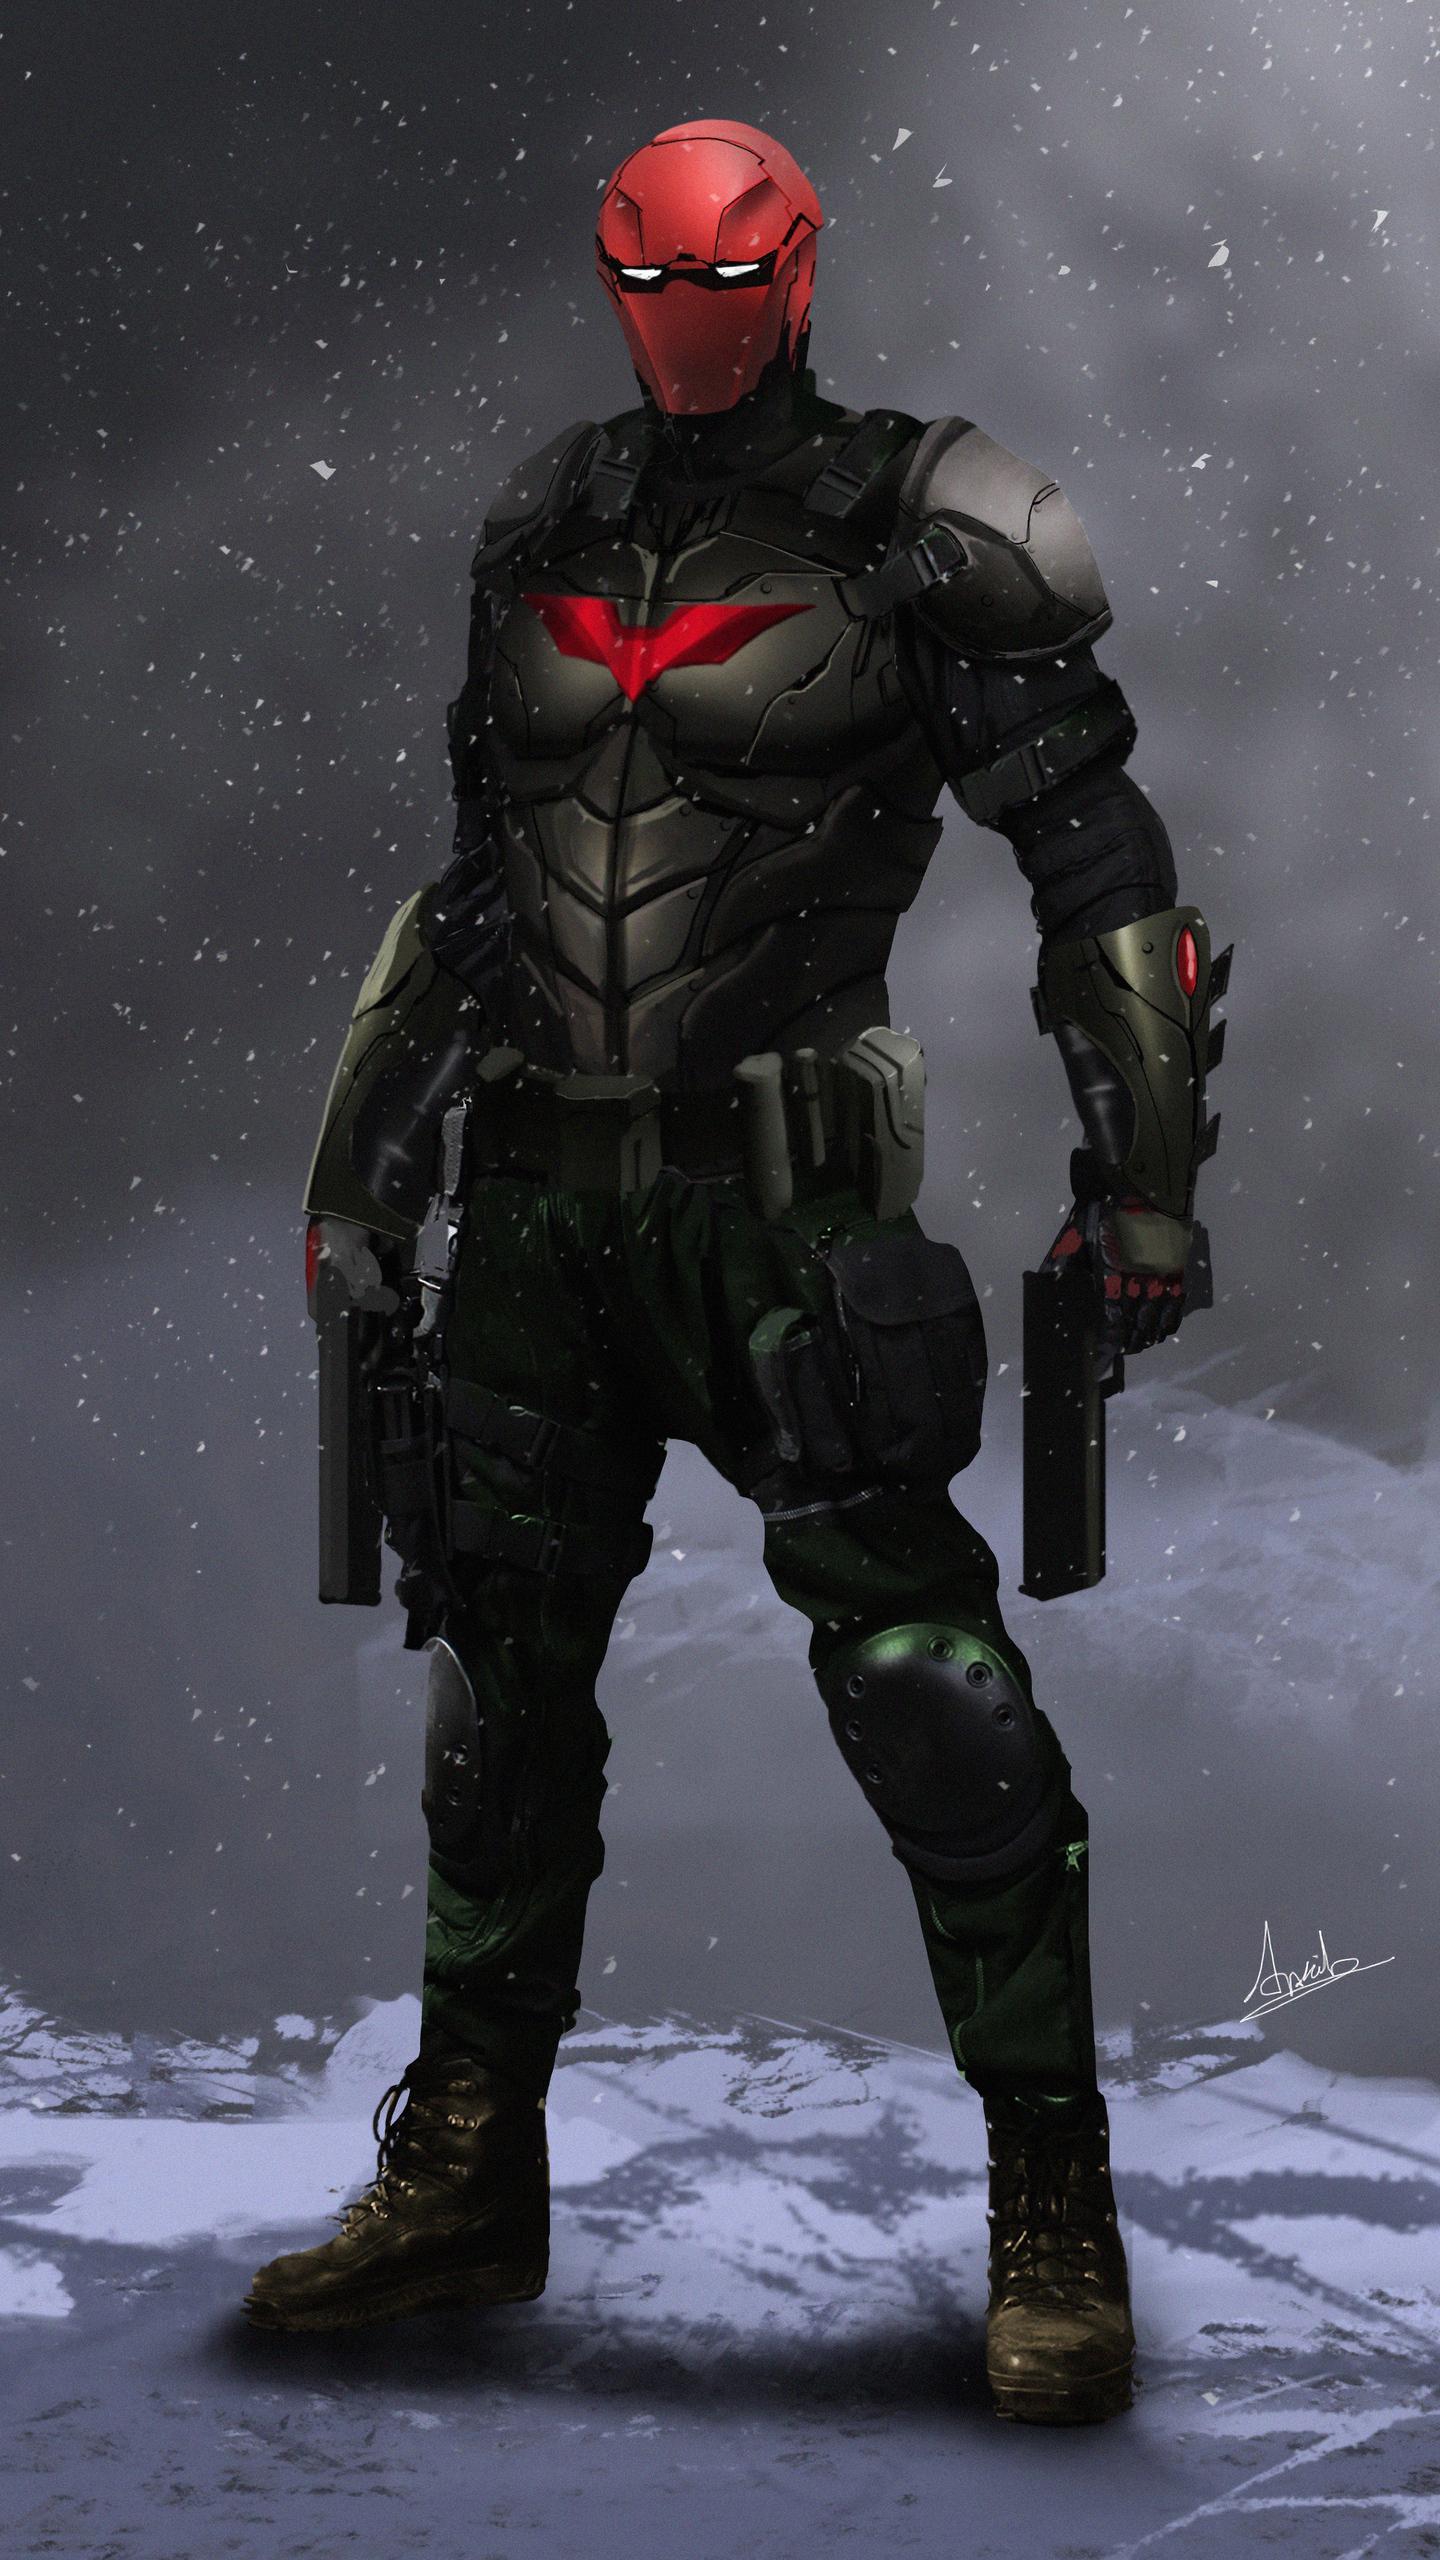 red-hood-superhero-art-9g.jpg